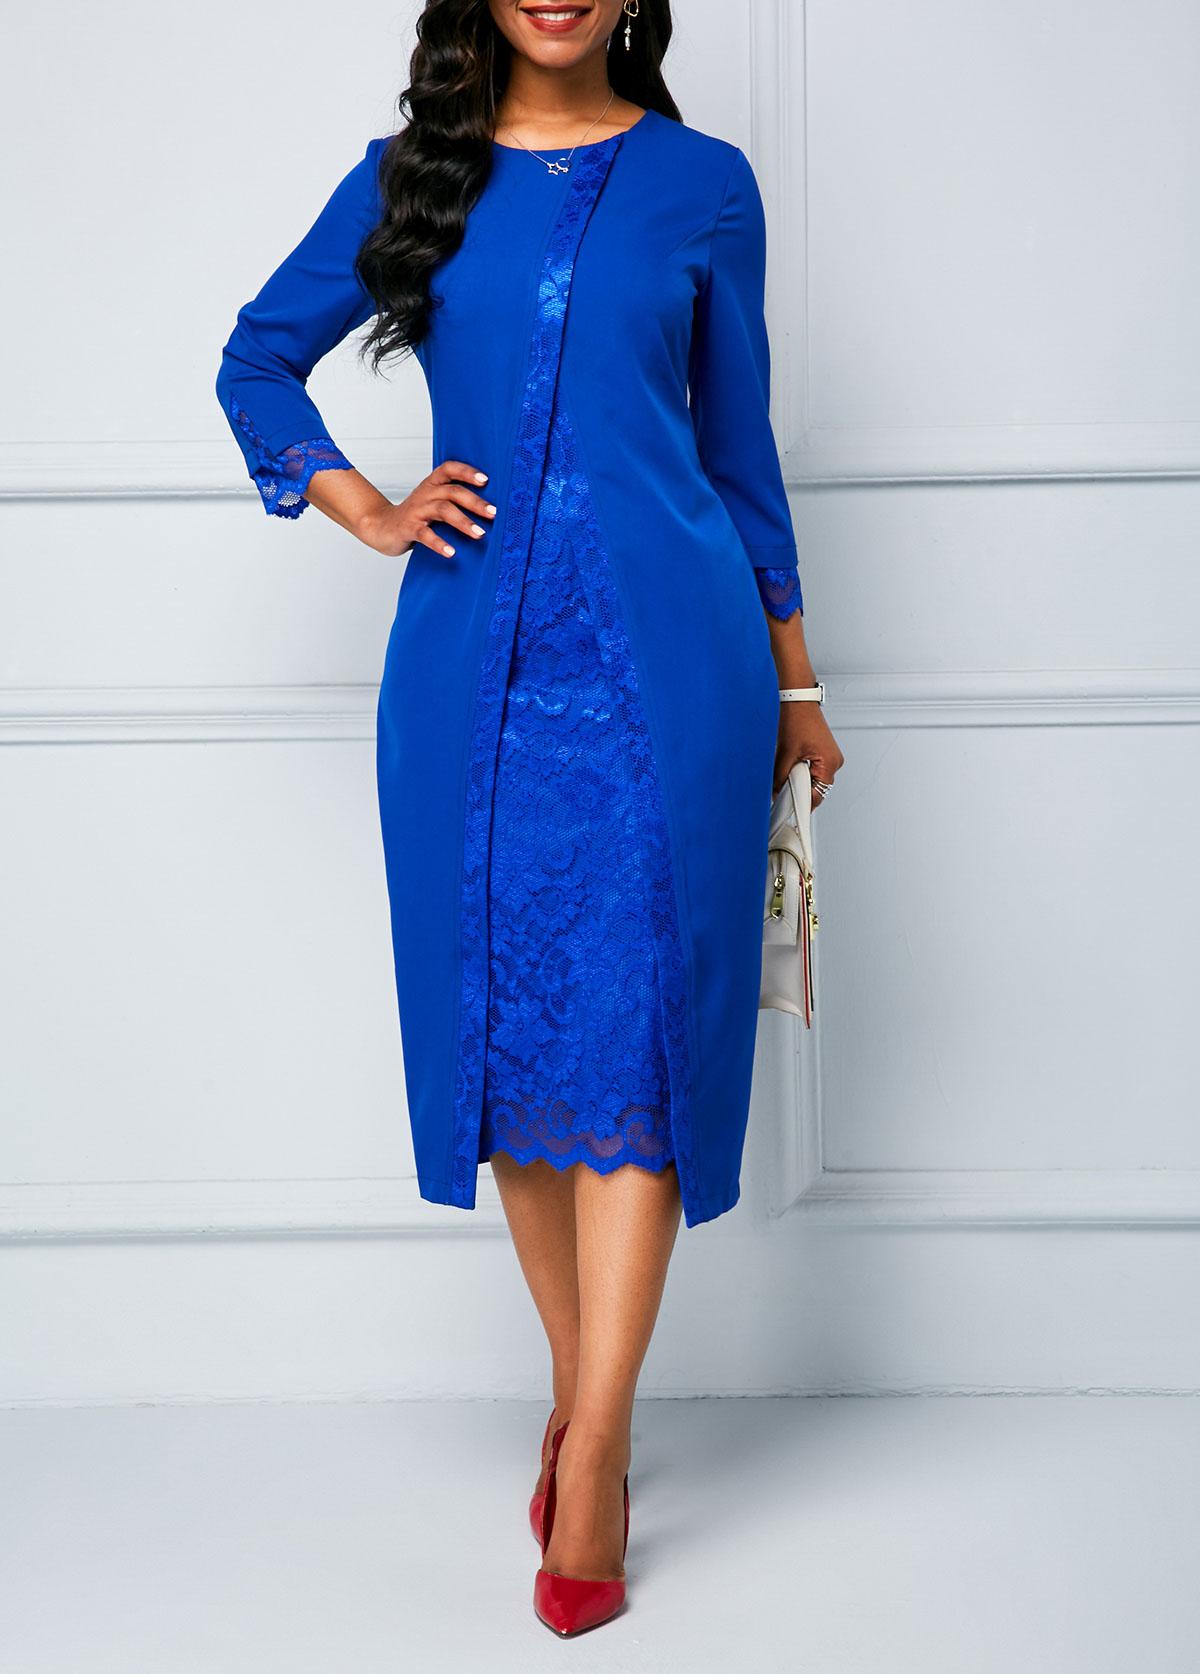 Lace Panel Royal Blue Long Sleeve Sheath Dress